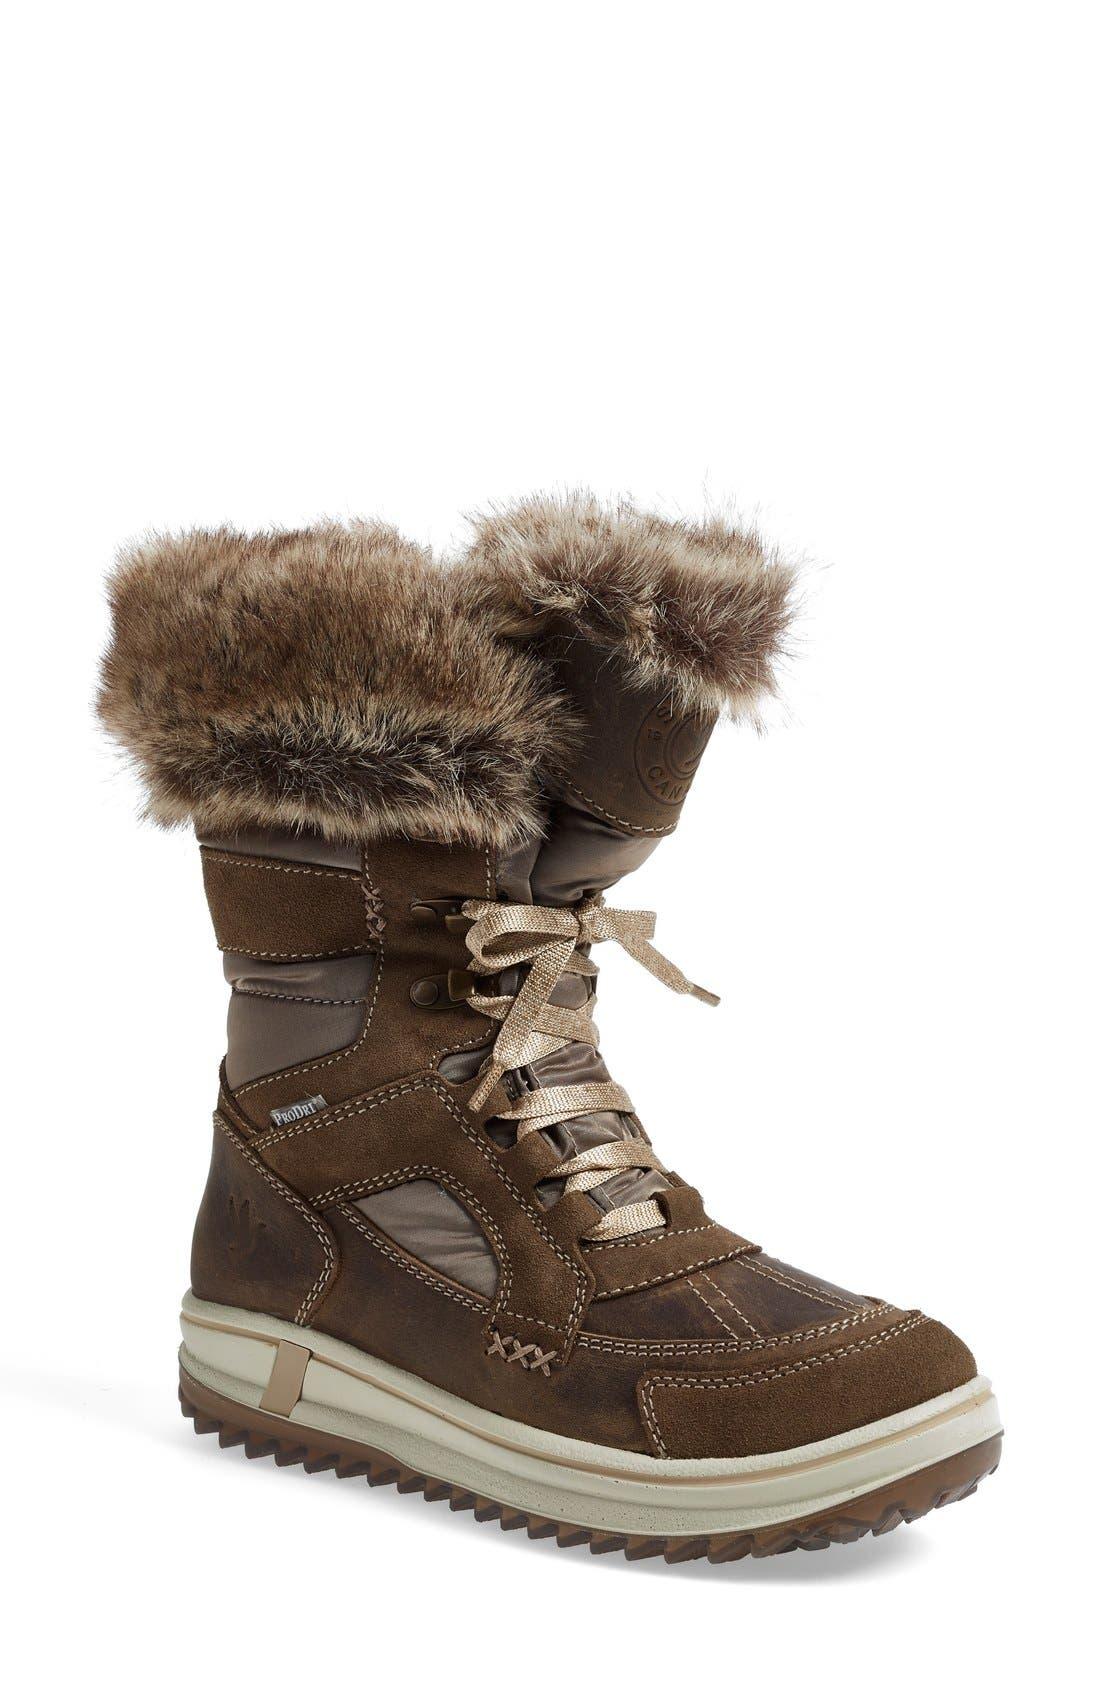 Main Image - Santana Canada 'Marta' Water Resistant Insulated Winter Boot (Women)